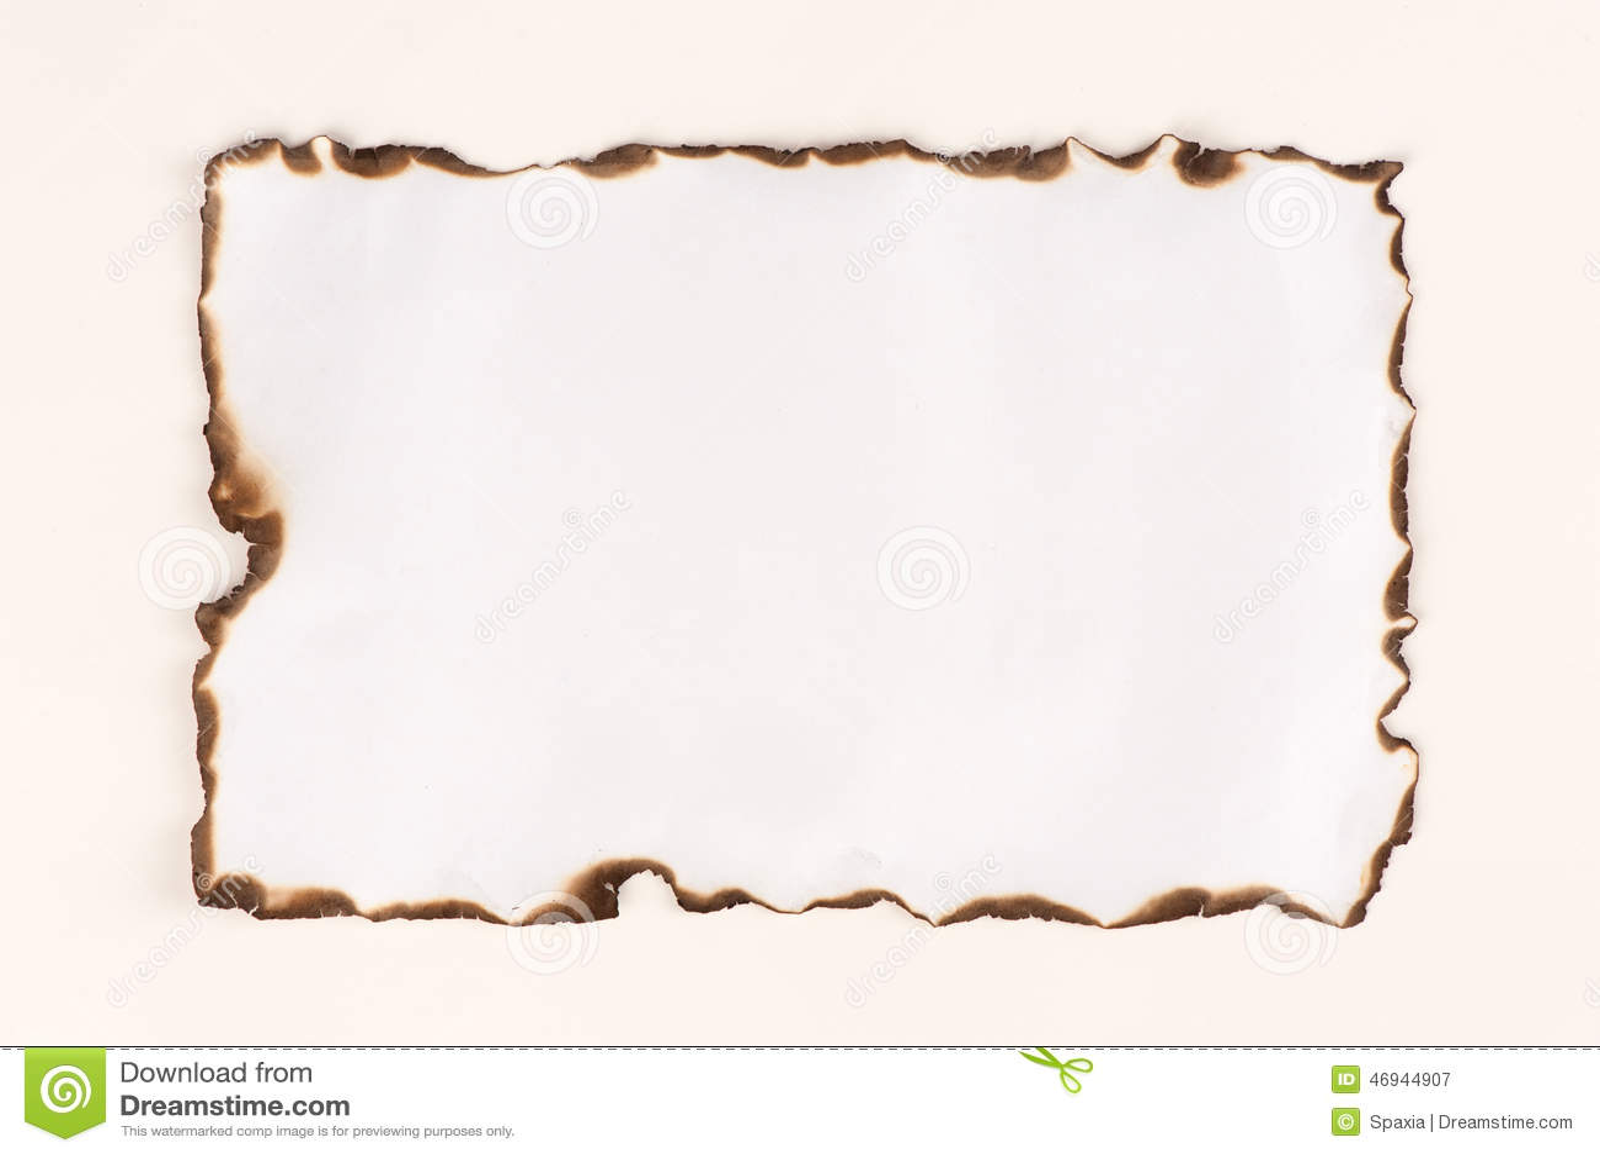 hoja de papel quemada imagen de archivo imagen de blank 46944907. Black Bedroom Furniture Sets. Home Design Ideas